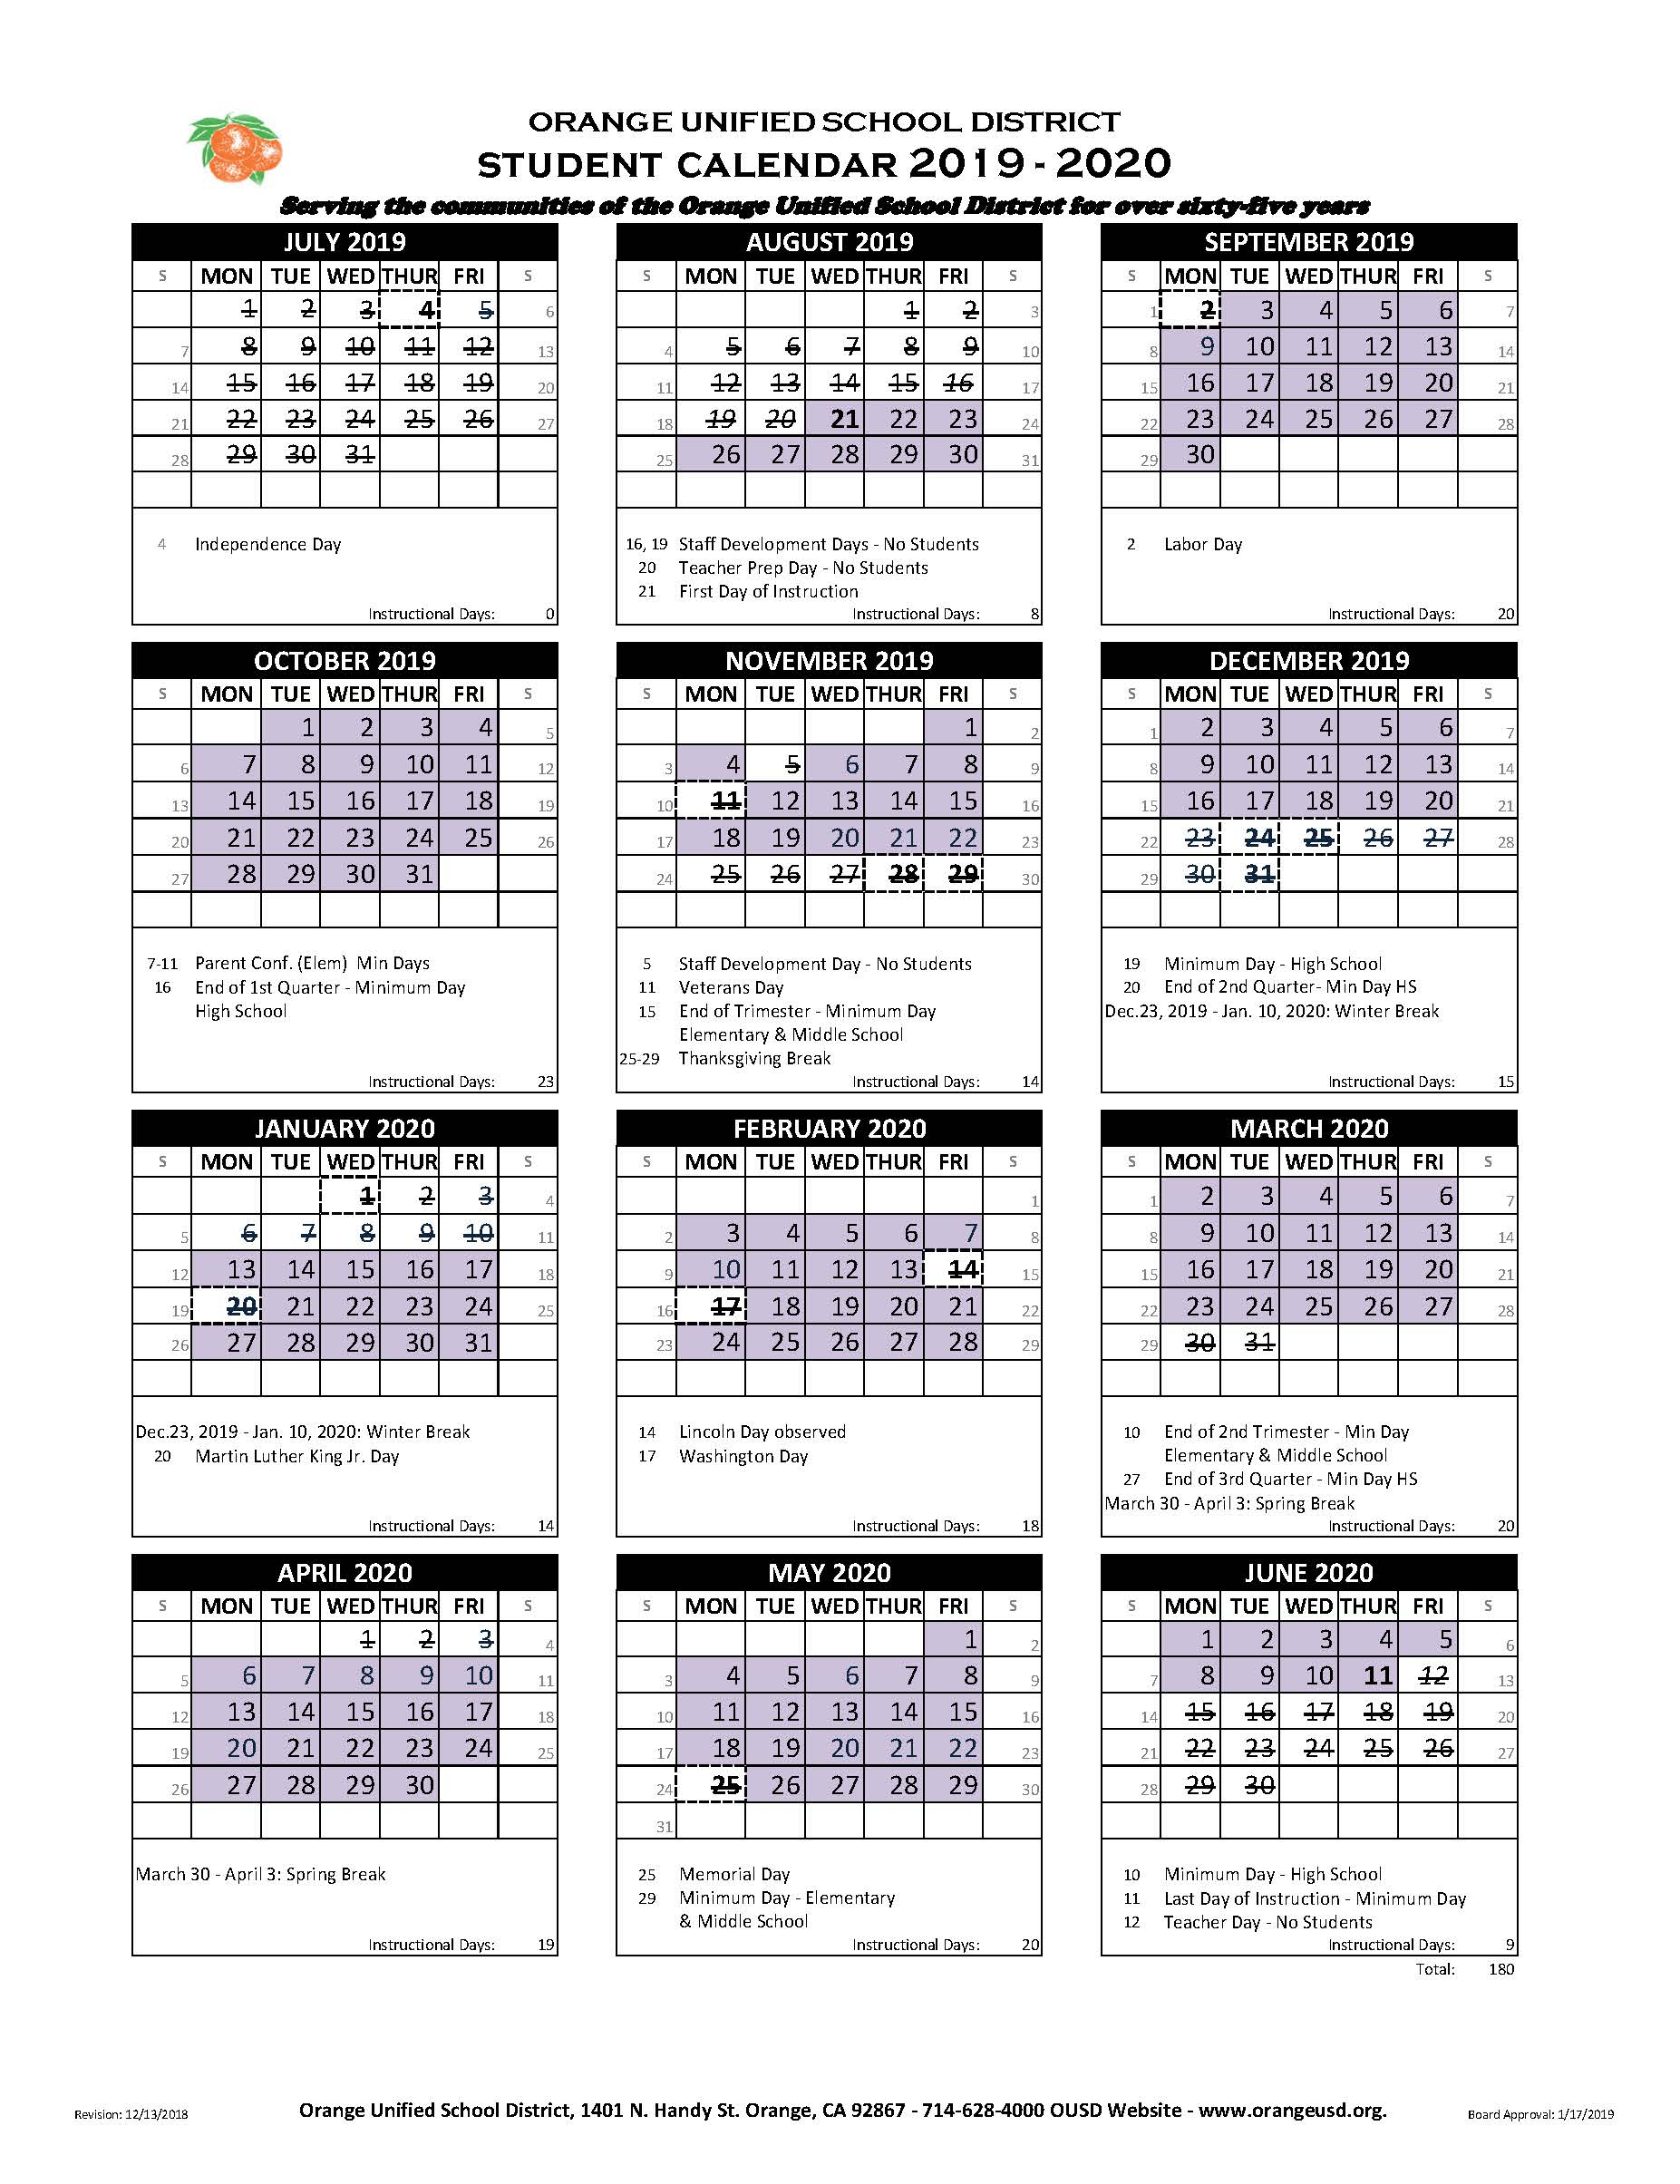 Student Calendar – Villa Park High School Intended For Diamond Bar High School Calendar 2021 2020